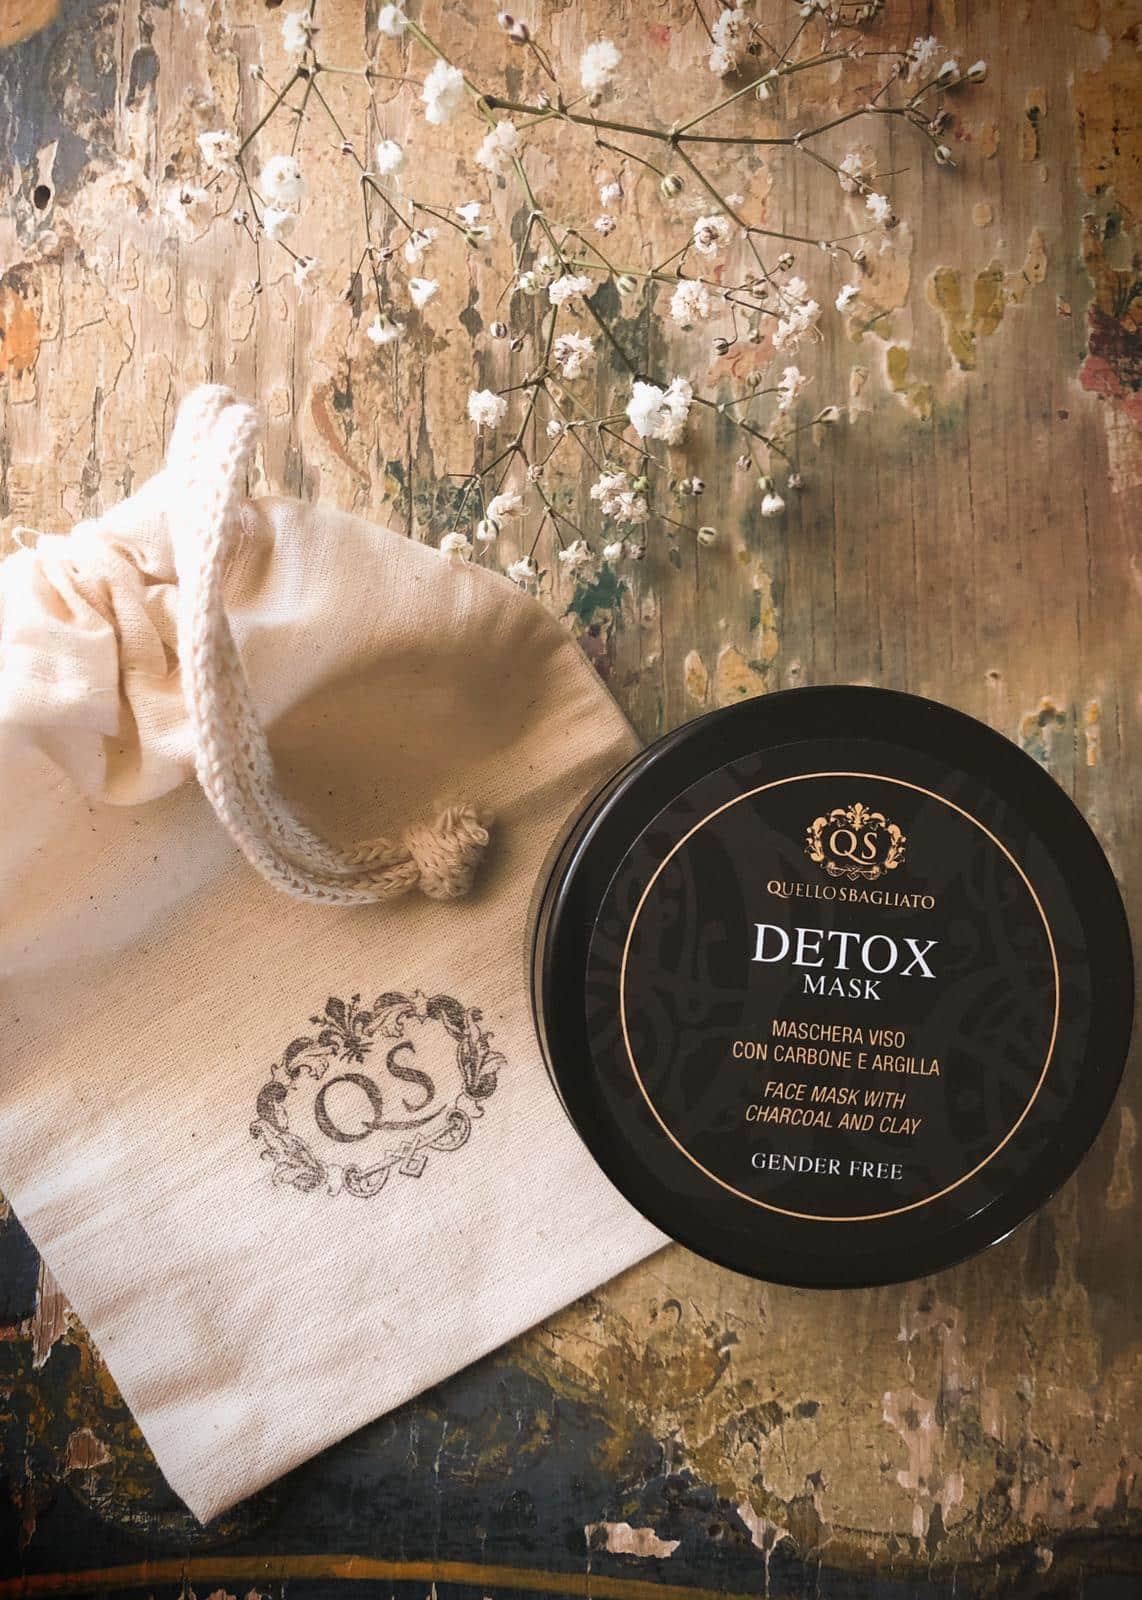 Maschera purificante carbone e argilla anti acne e brufoli